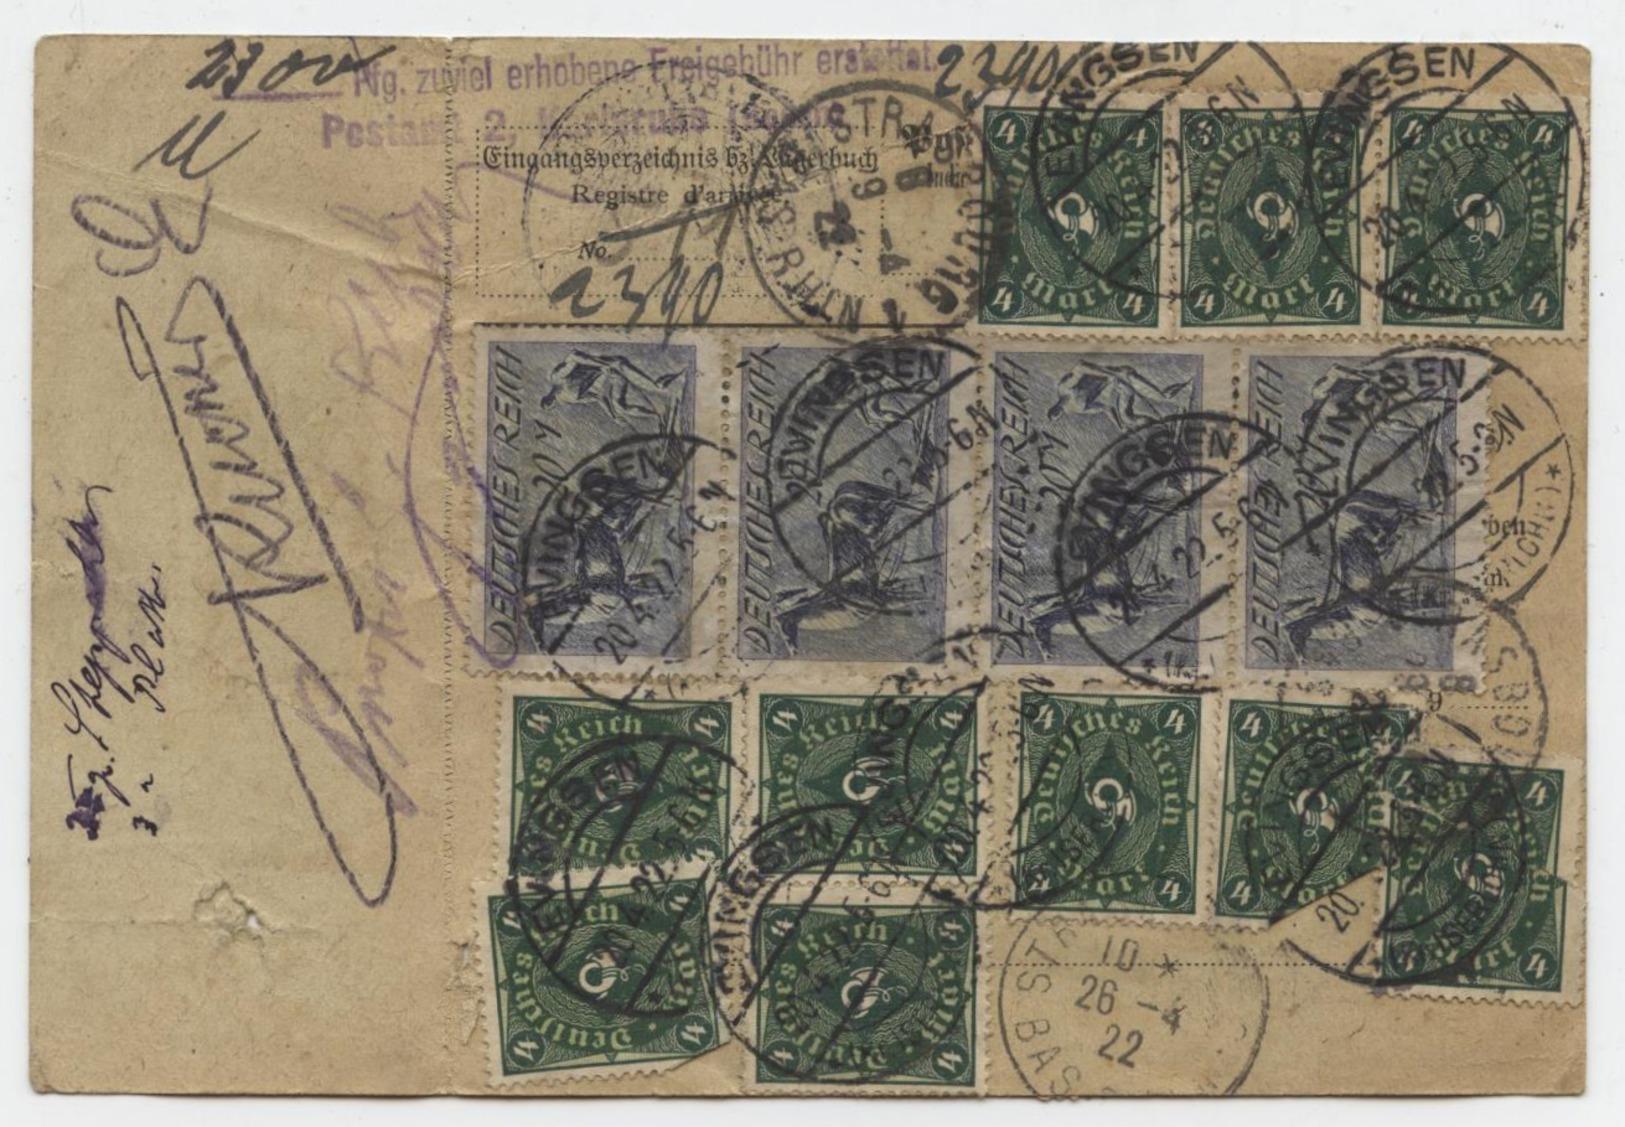 Evingsen 20.4.1922 Kr.Iserlohn Par Karlsruhe Bulletin D'expédition Paketkarte Pour Strasbourg - Germany